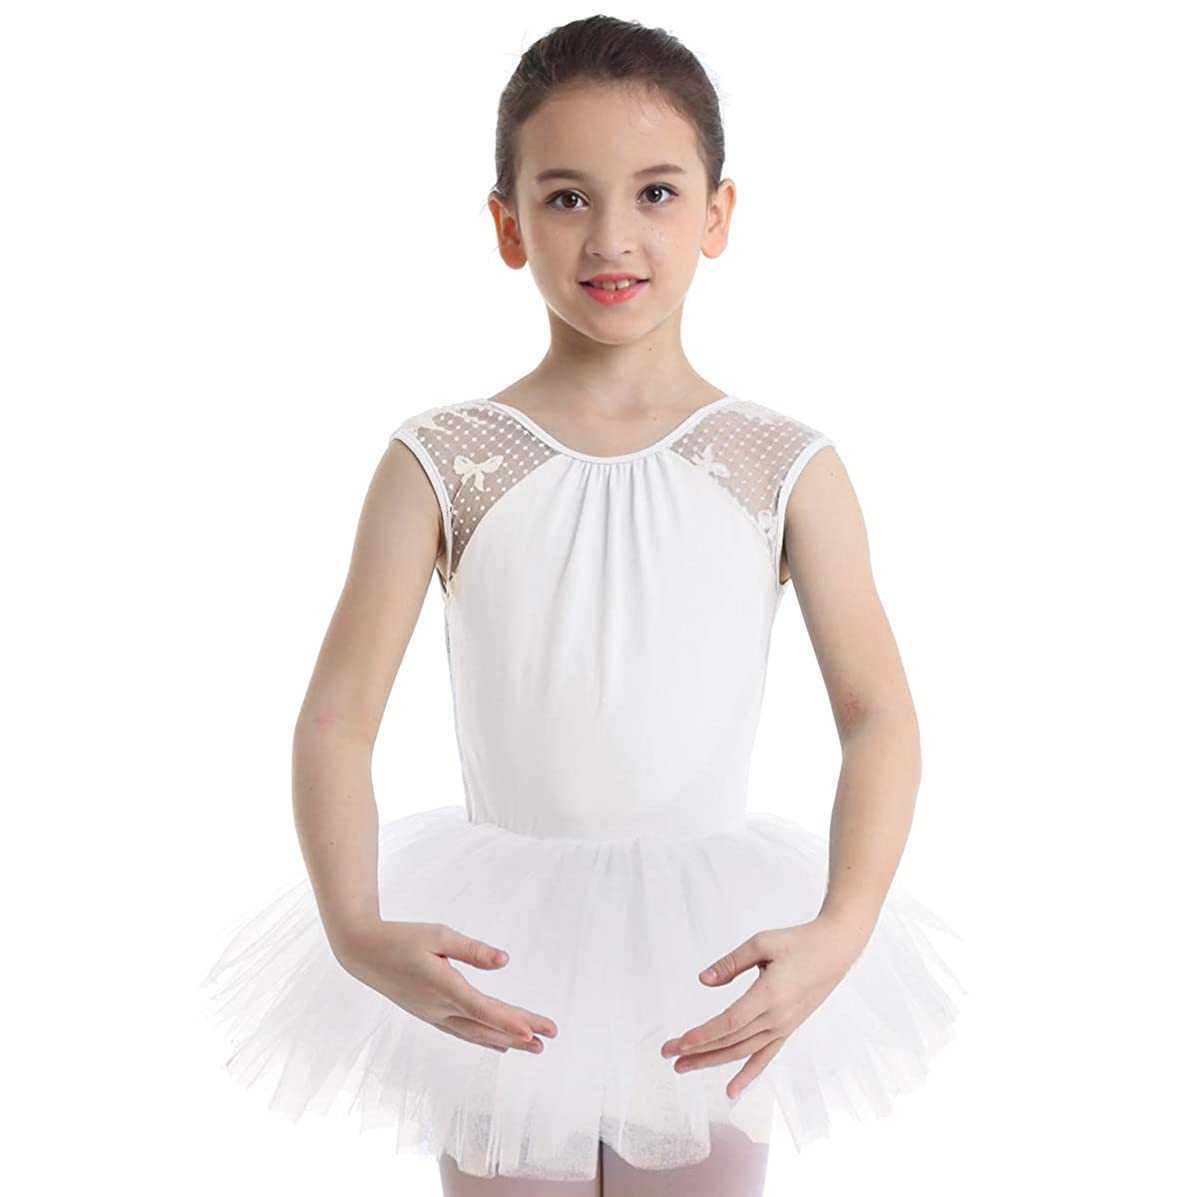 zdhoor Kids Girls Sleeveless Ballet Dance Dress Tutu Skirts Gymnastics Leotard Lace Back Dancewear Jumpsuit